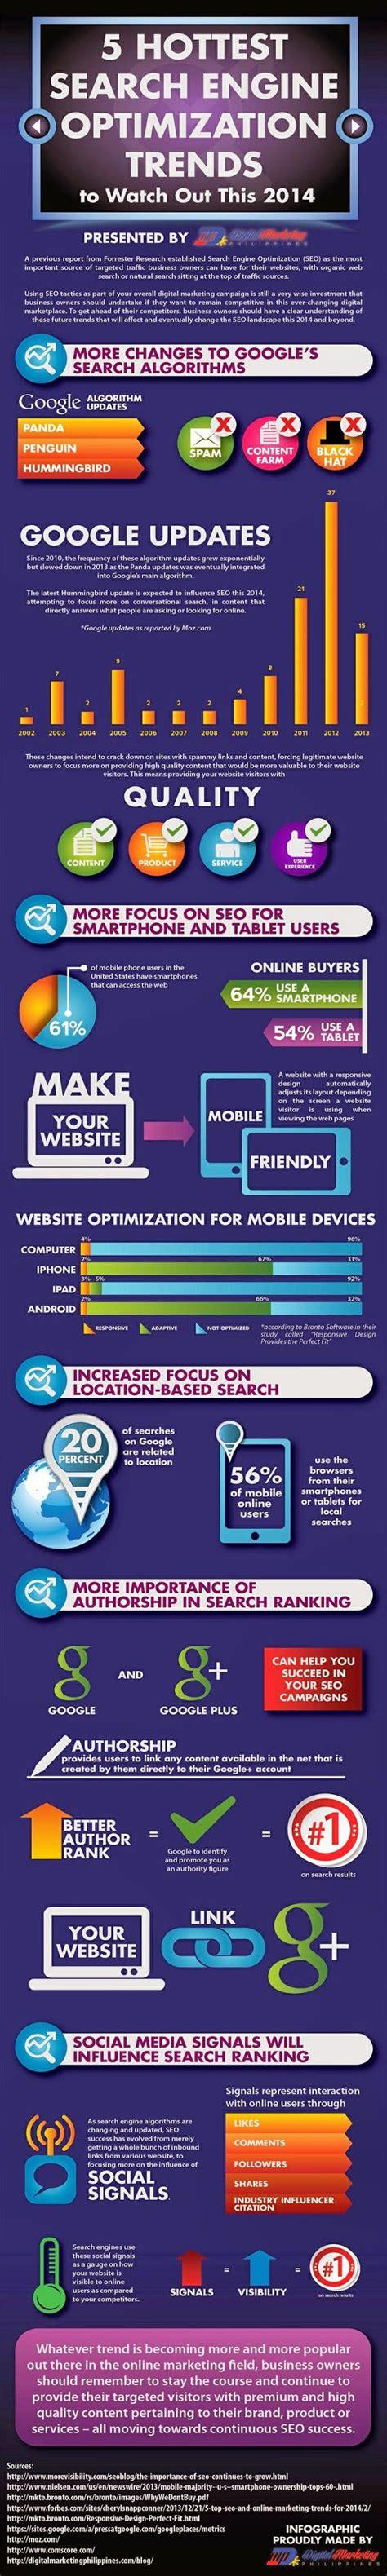 Malaysia Search Engine 5 Search Engine Optimization Trends 2014 Dcreative Web Design Graphic Design Malaysia